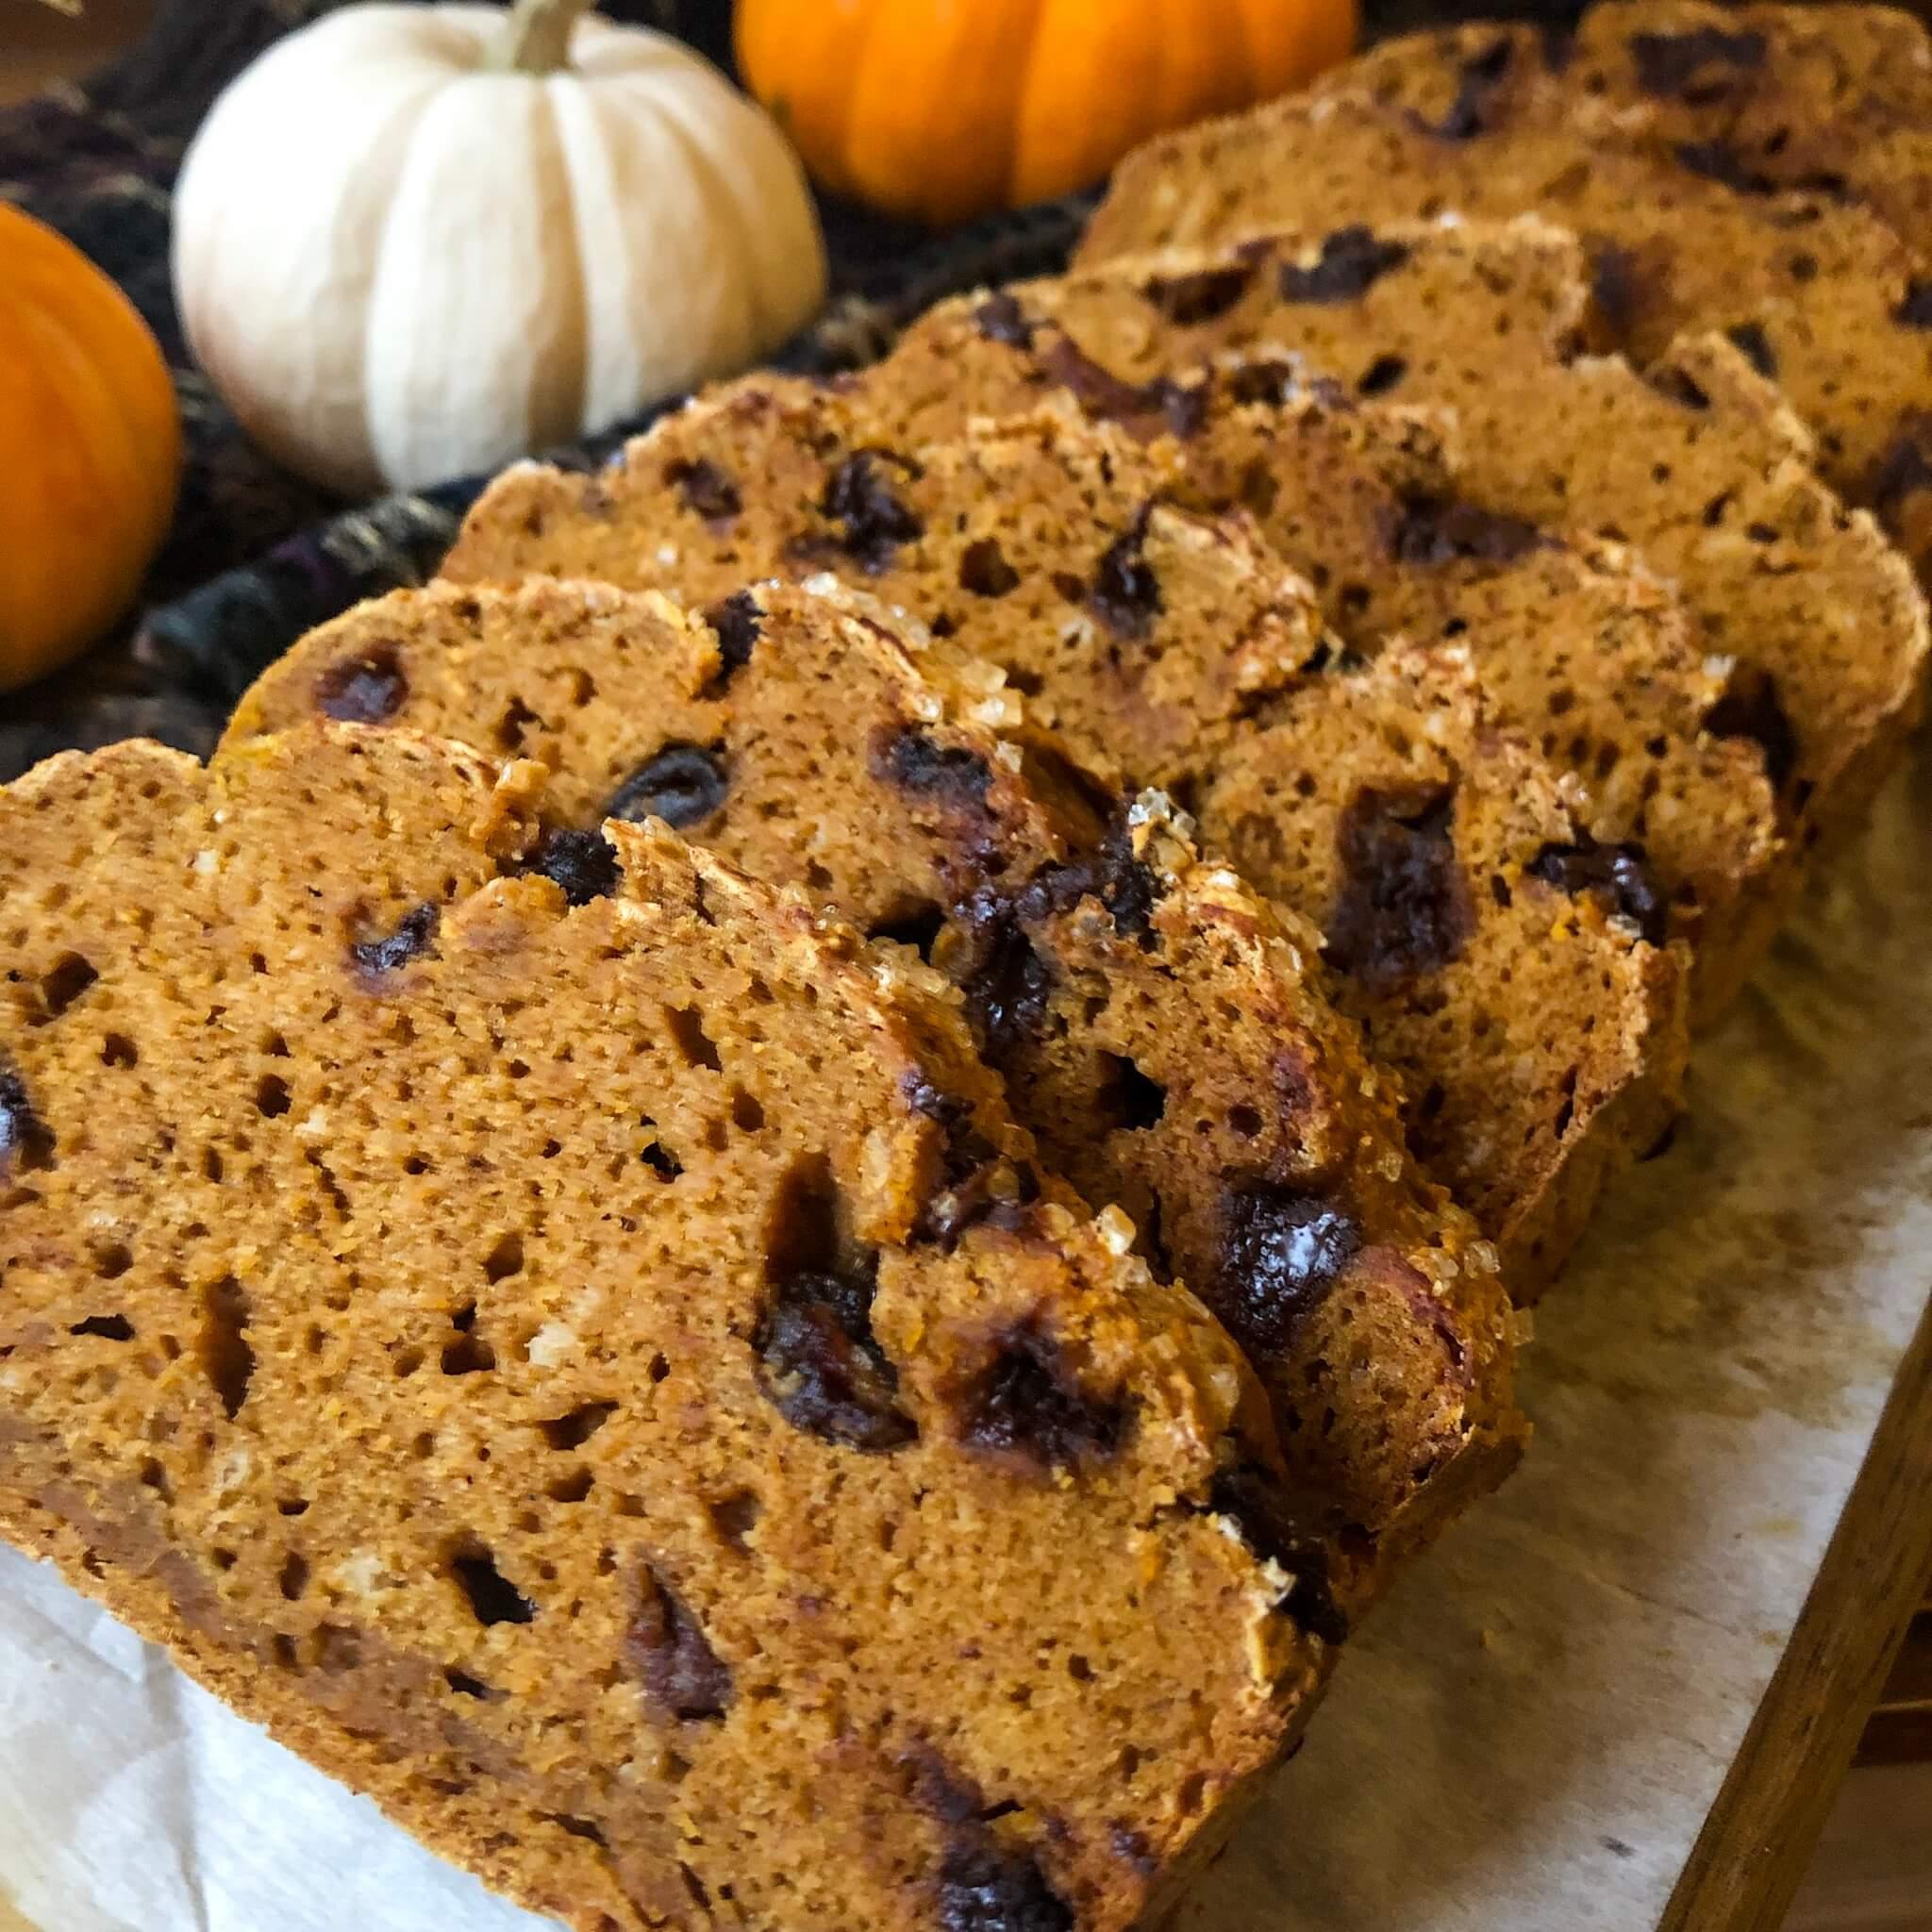 pumpkin bread slices up close